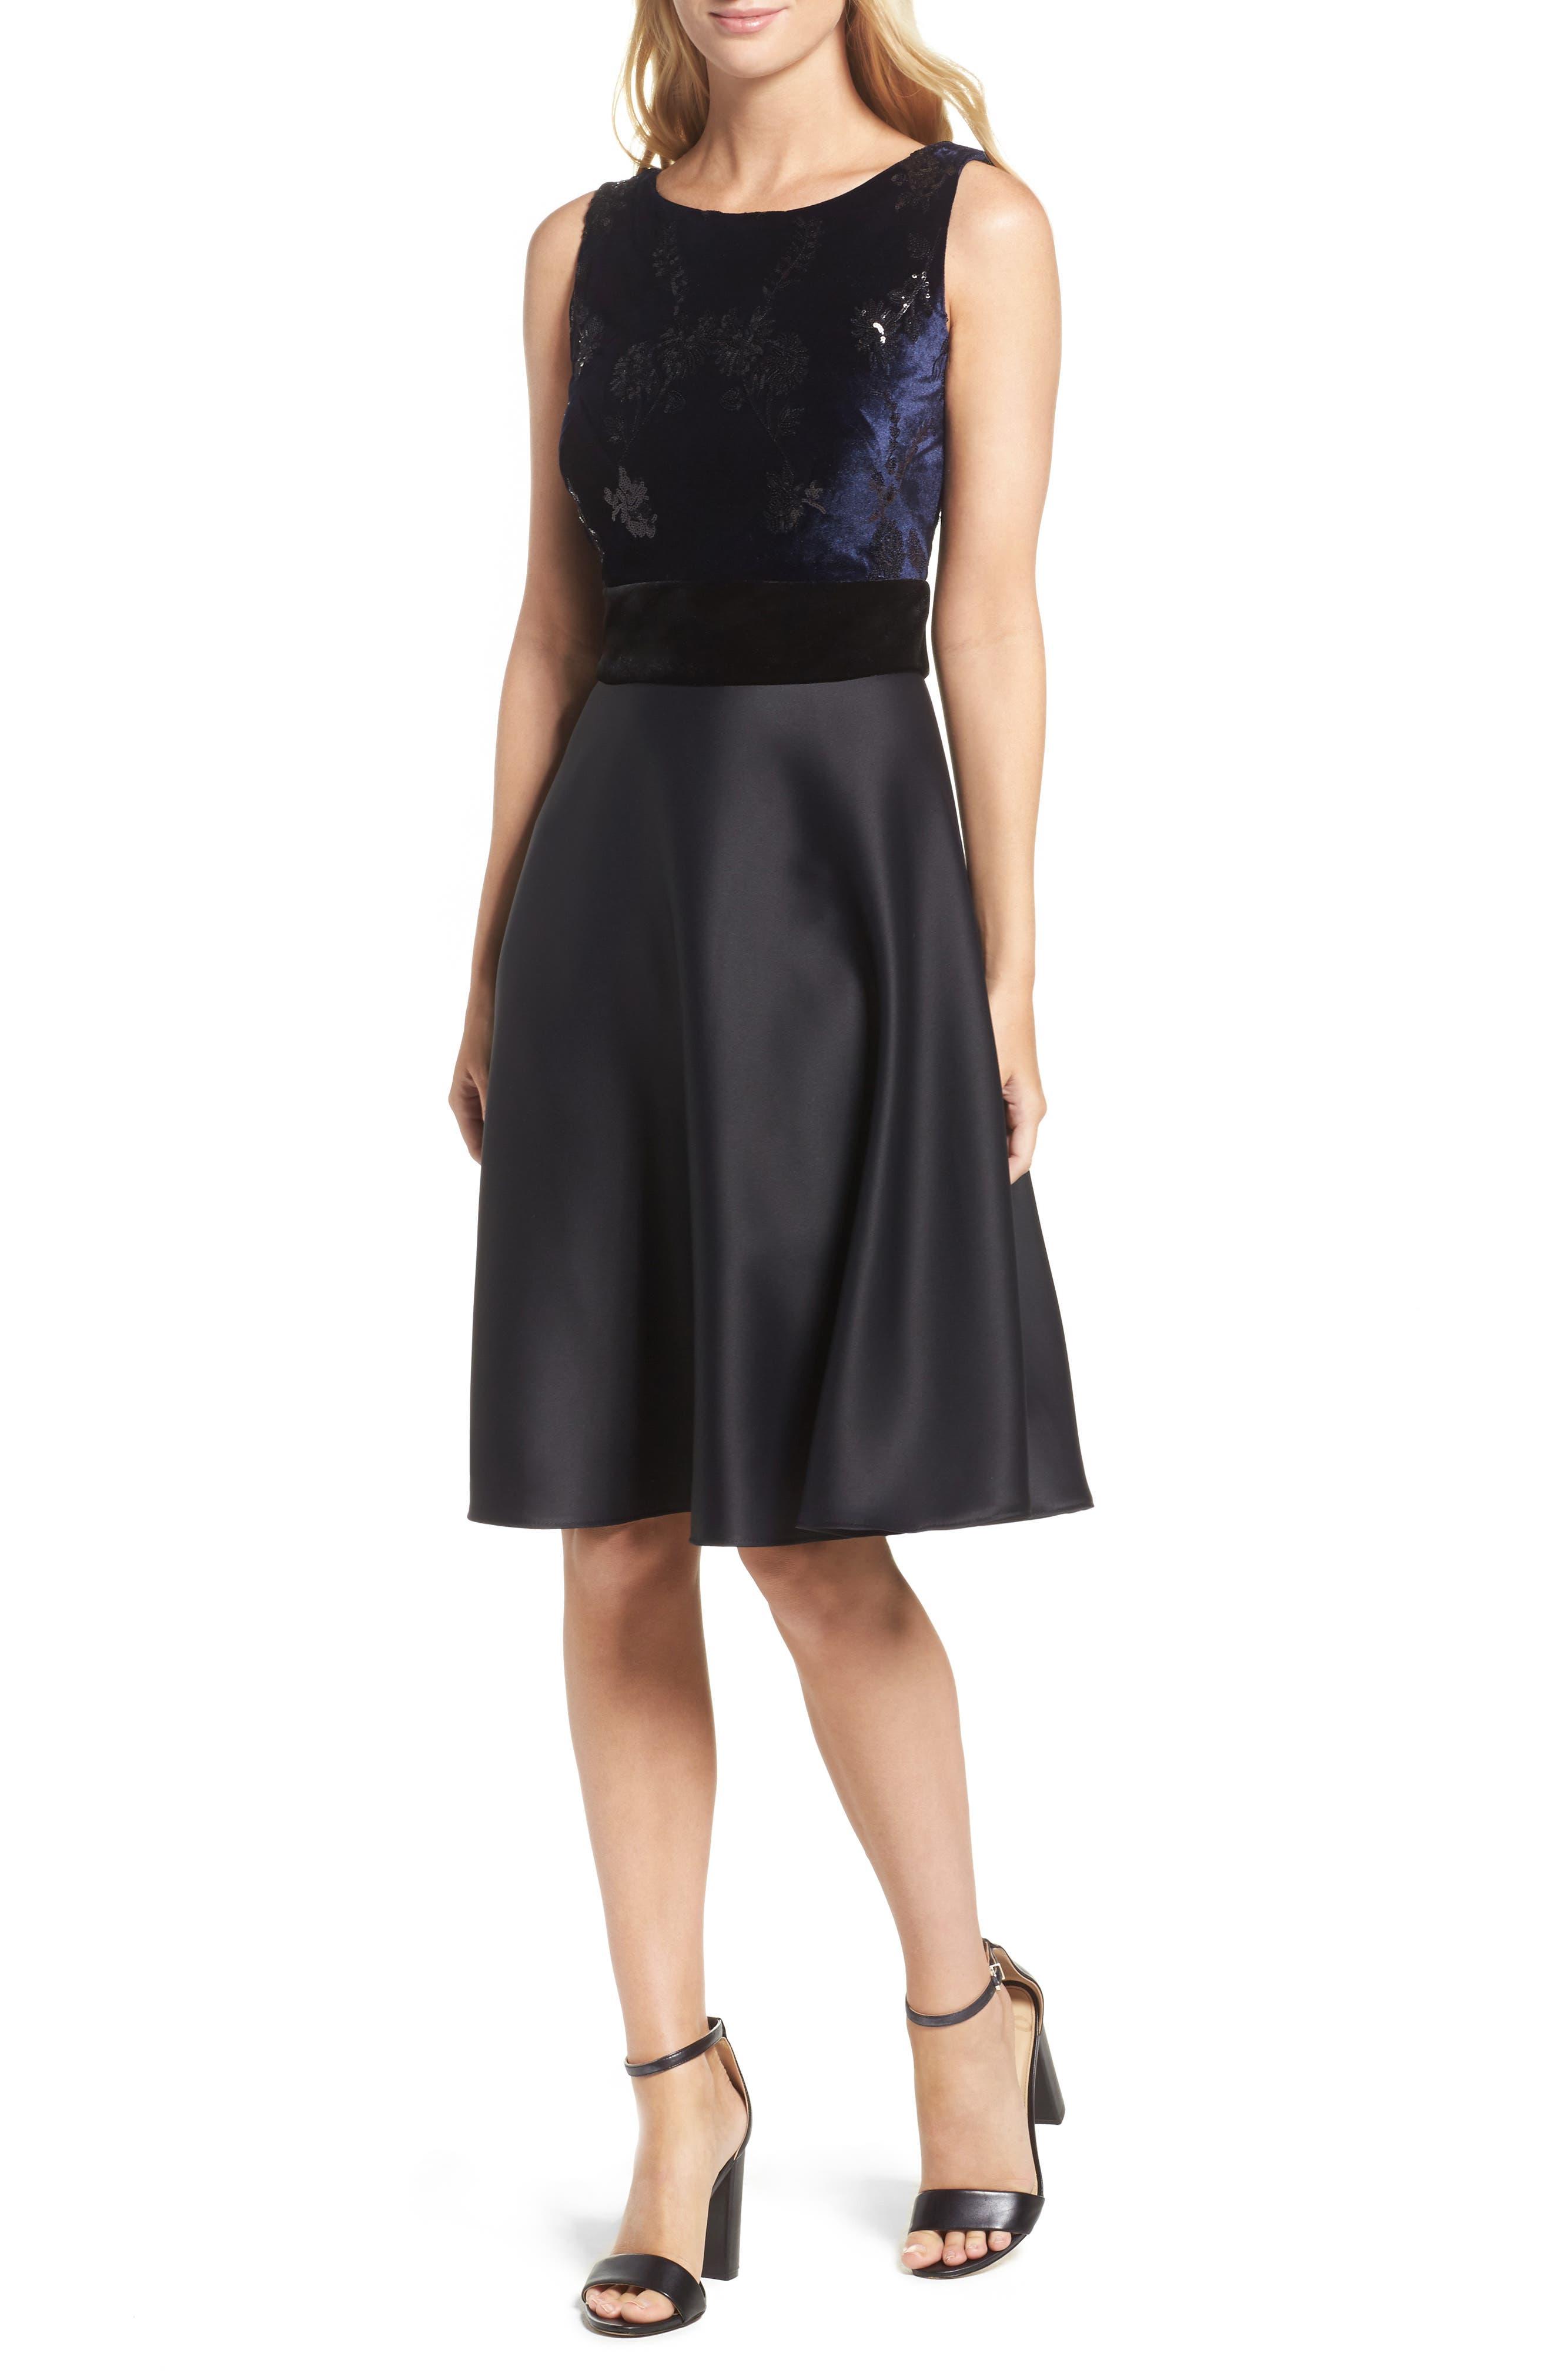 Taylor Dresses Fit & Flare Dress